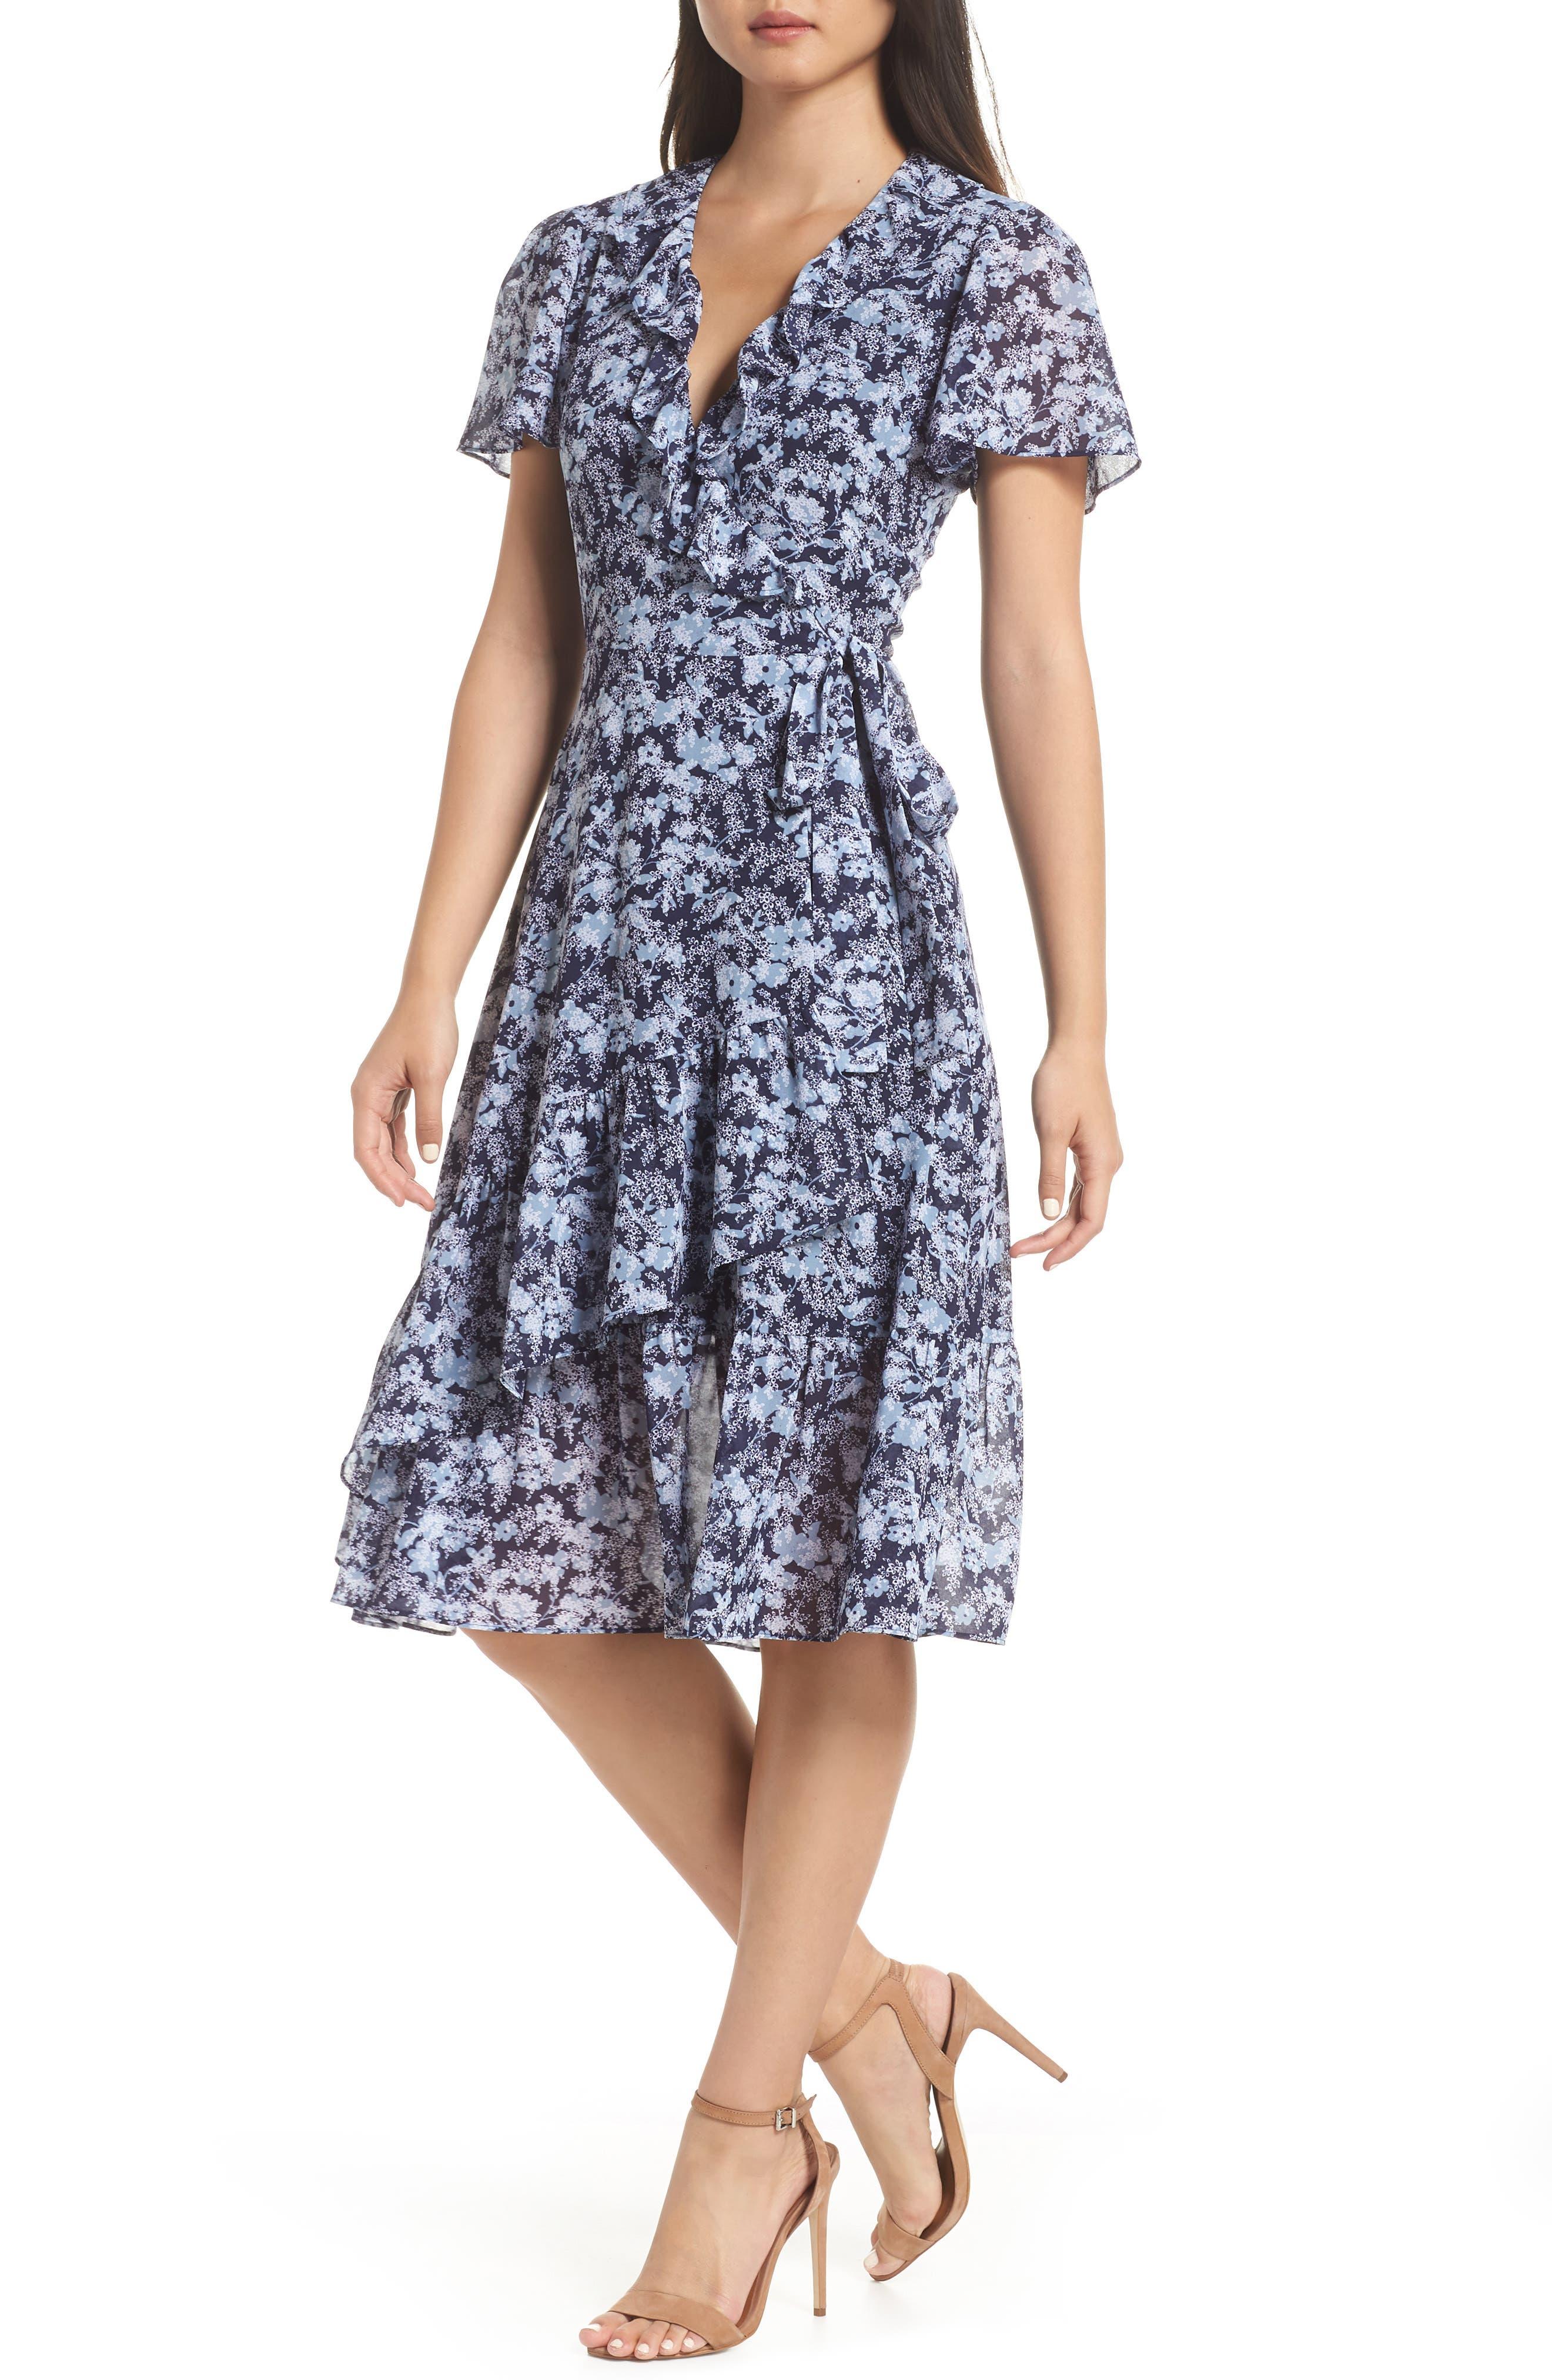 MICHAEL MICHAEL KORS Ruffle Wrap Dress, Main, color, TRUE NAVY/CHAMBRAY